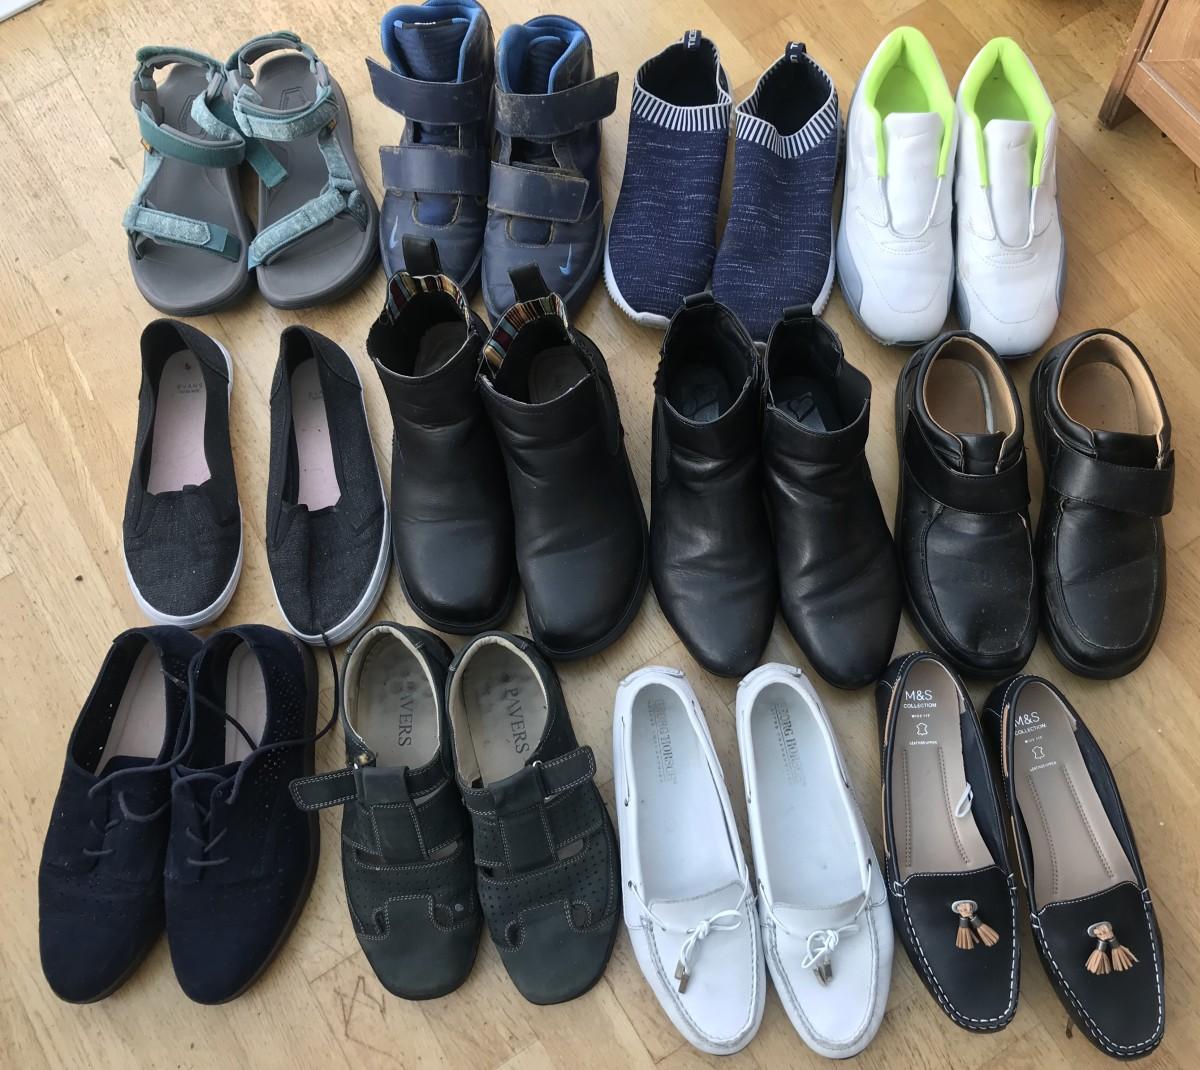 Women's Shoes That Men Can Wear